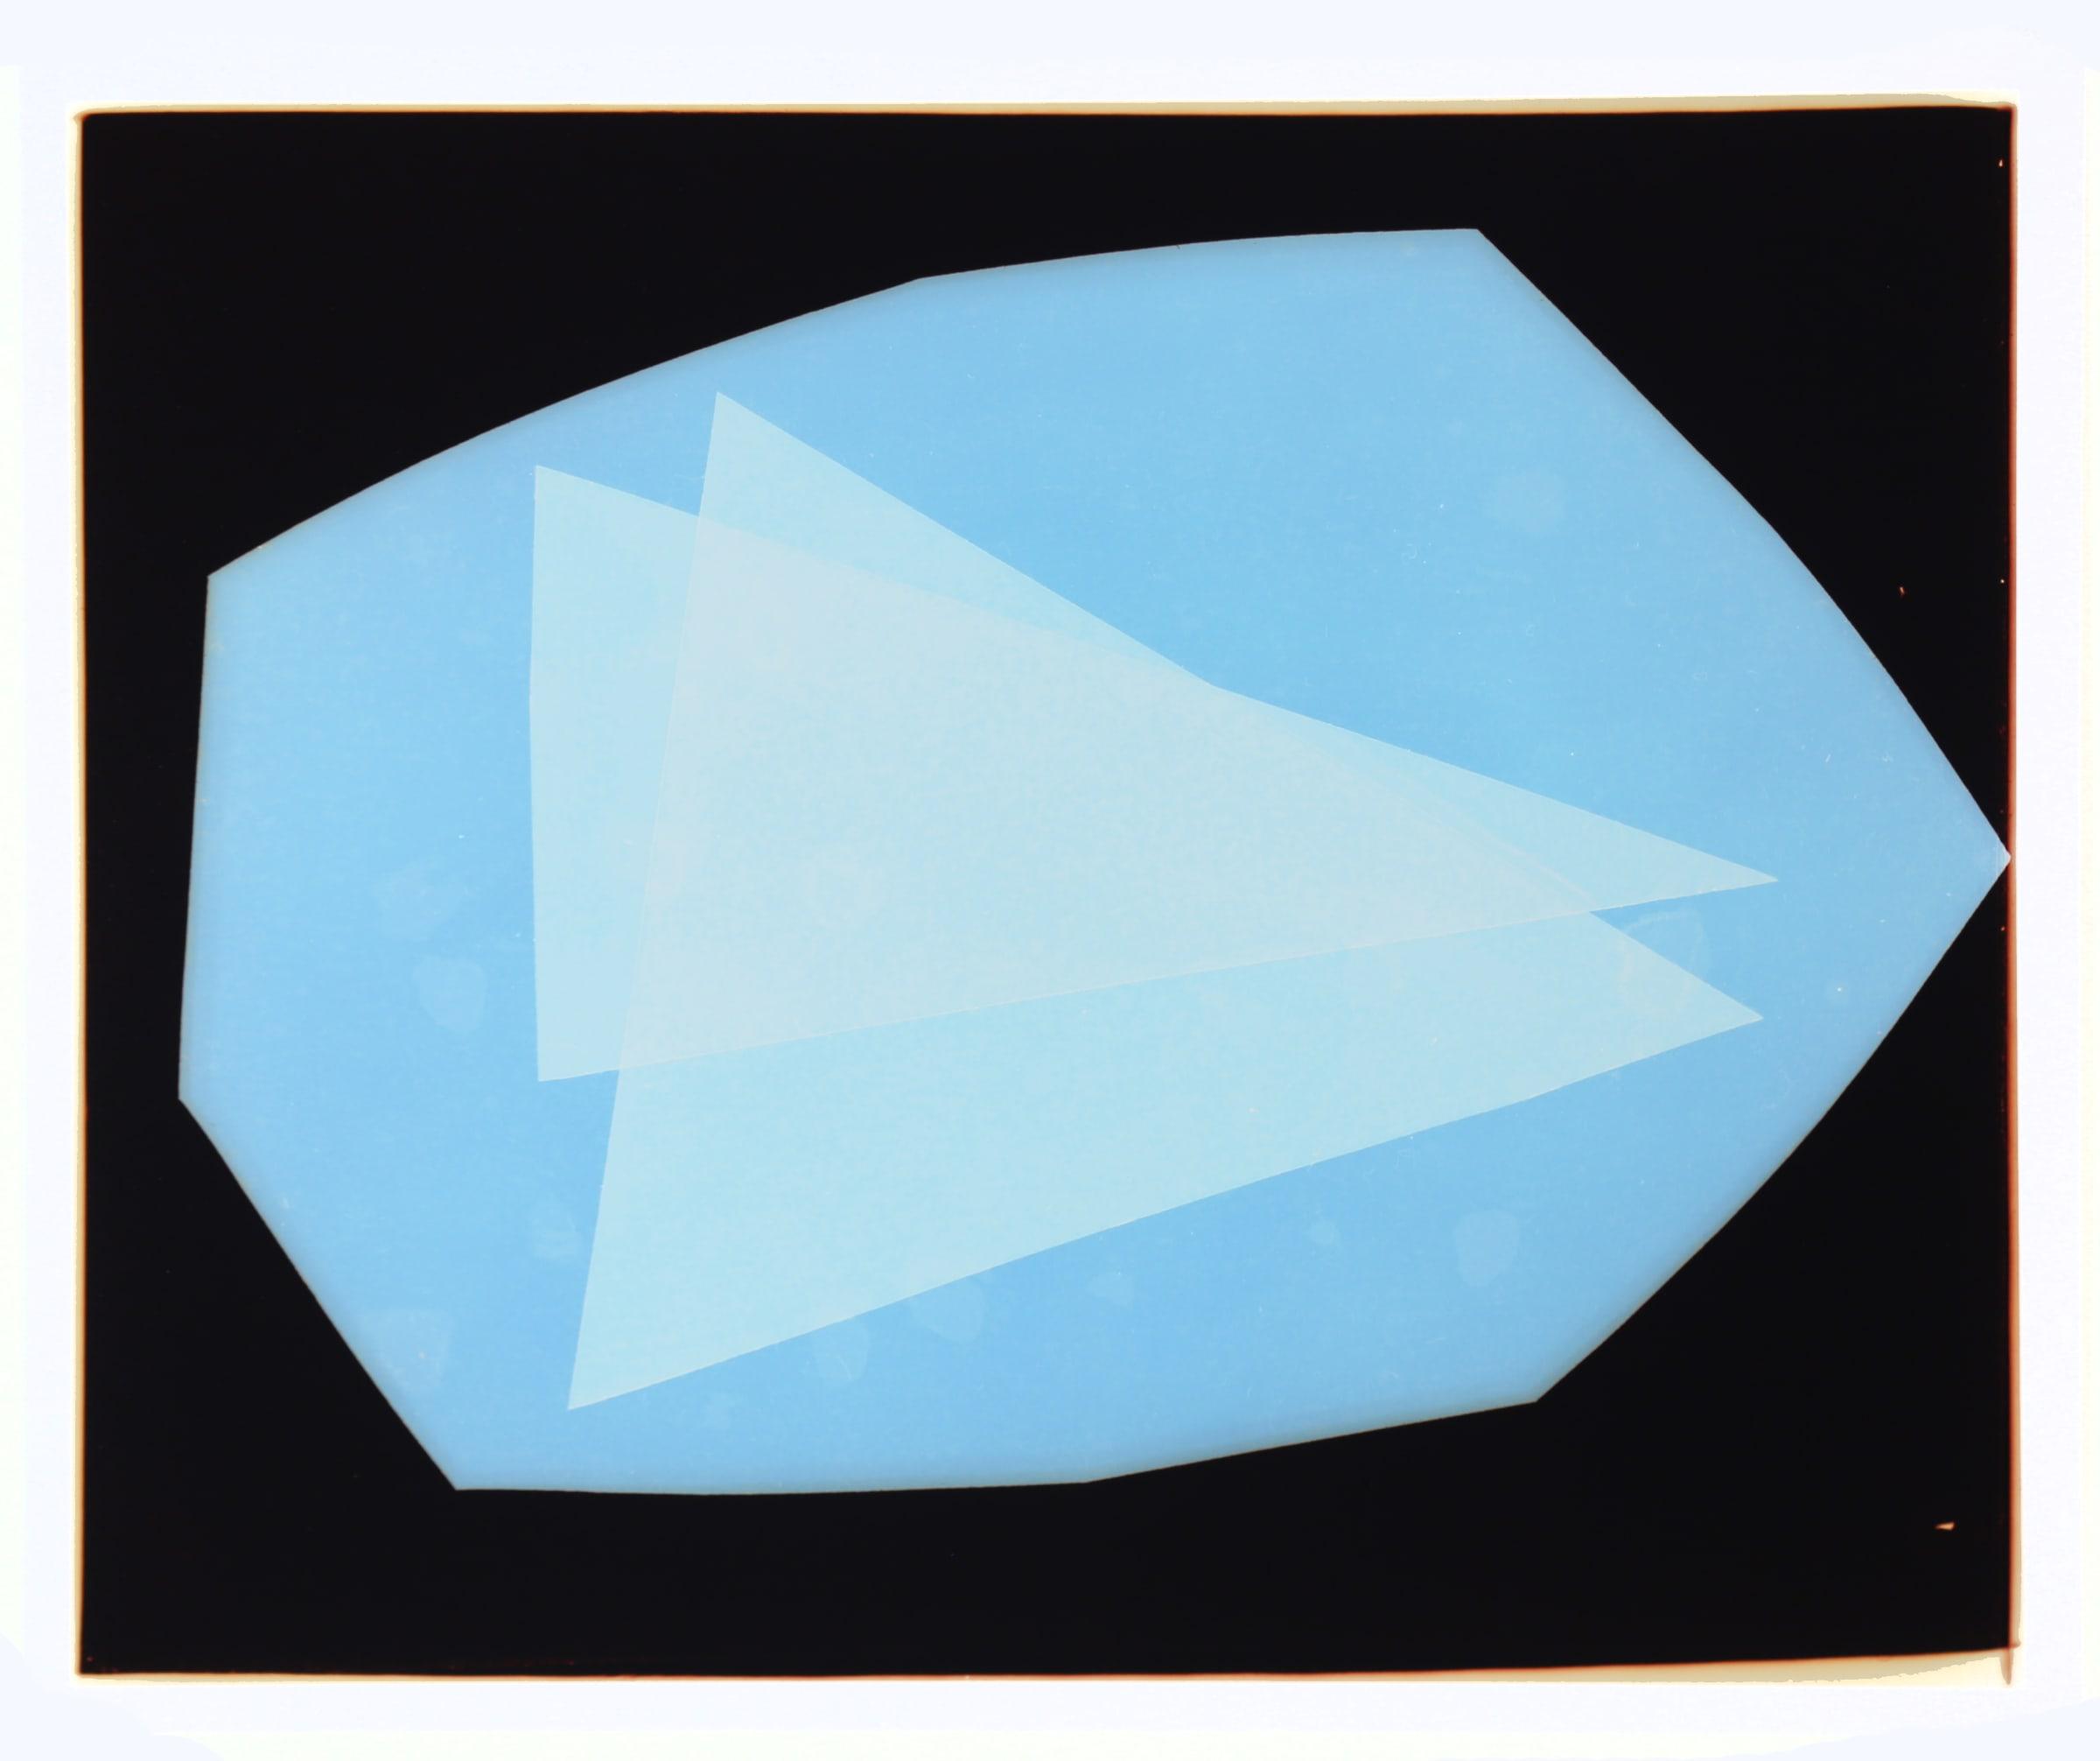 "<span class=""link fancybox-details-link""><a href=""/exhibitions/10/works/artworks17/"">View Detail Page</a></span><div class=""artist""><strong>Liz Nielsen</strong></div><div class=""title""><em>Paper Airplanes</em>, 2017</div><div class=""signed_and_dated"">Signed, titled and dated on artist's label</div><div class=""medium"">Analogue Chromogenic Photogram on Fuji Lustre, Unique</div><div class=""dimensions"">50.8 x 61 cm<br>20 x 24 in</div>"